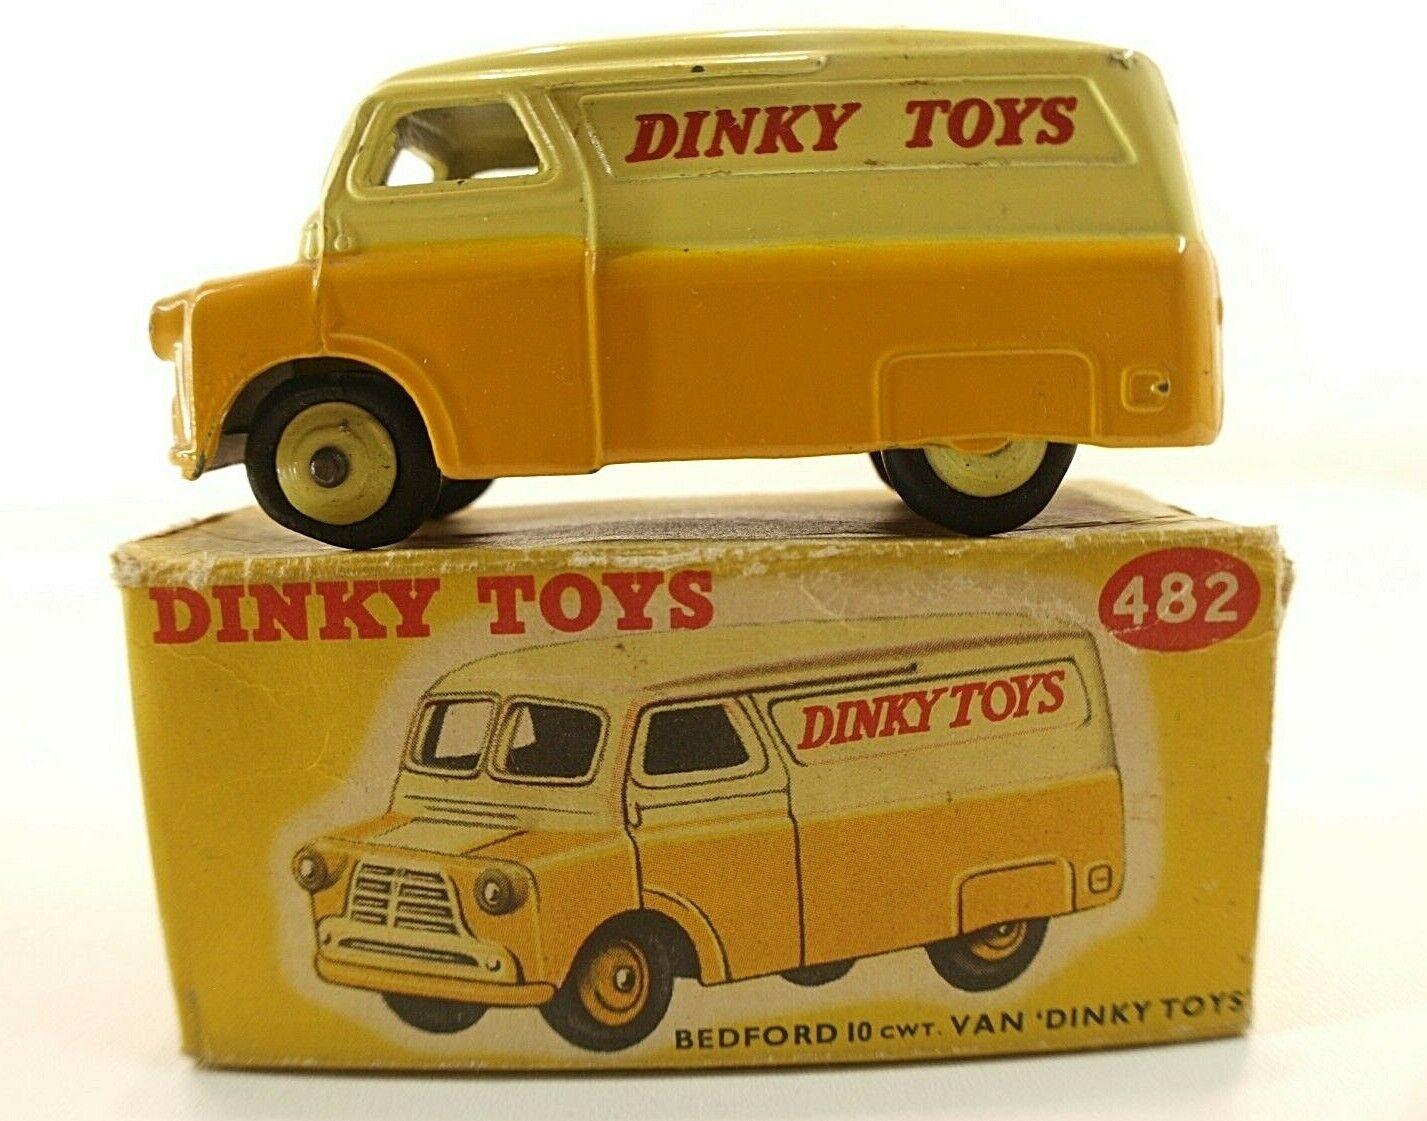 Dinky Toys GB n° 482 fourgon Bedford Dinky Toys en boite